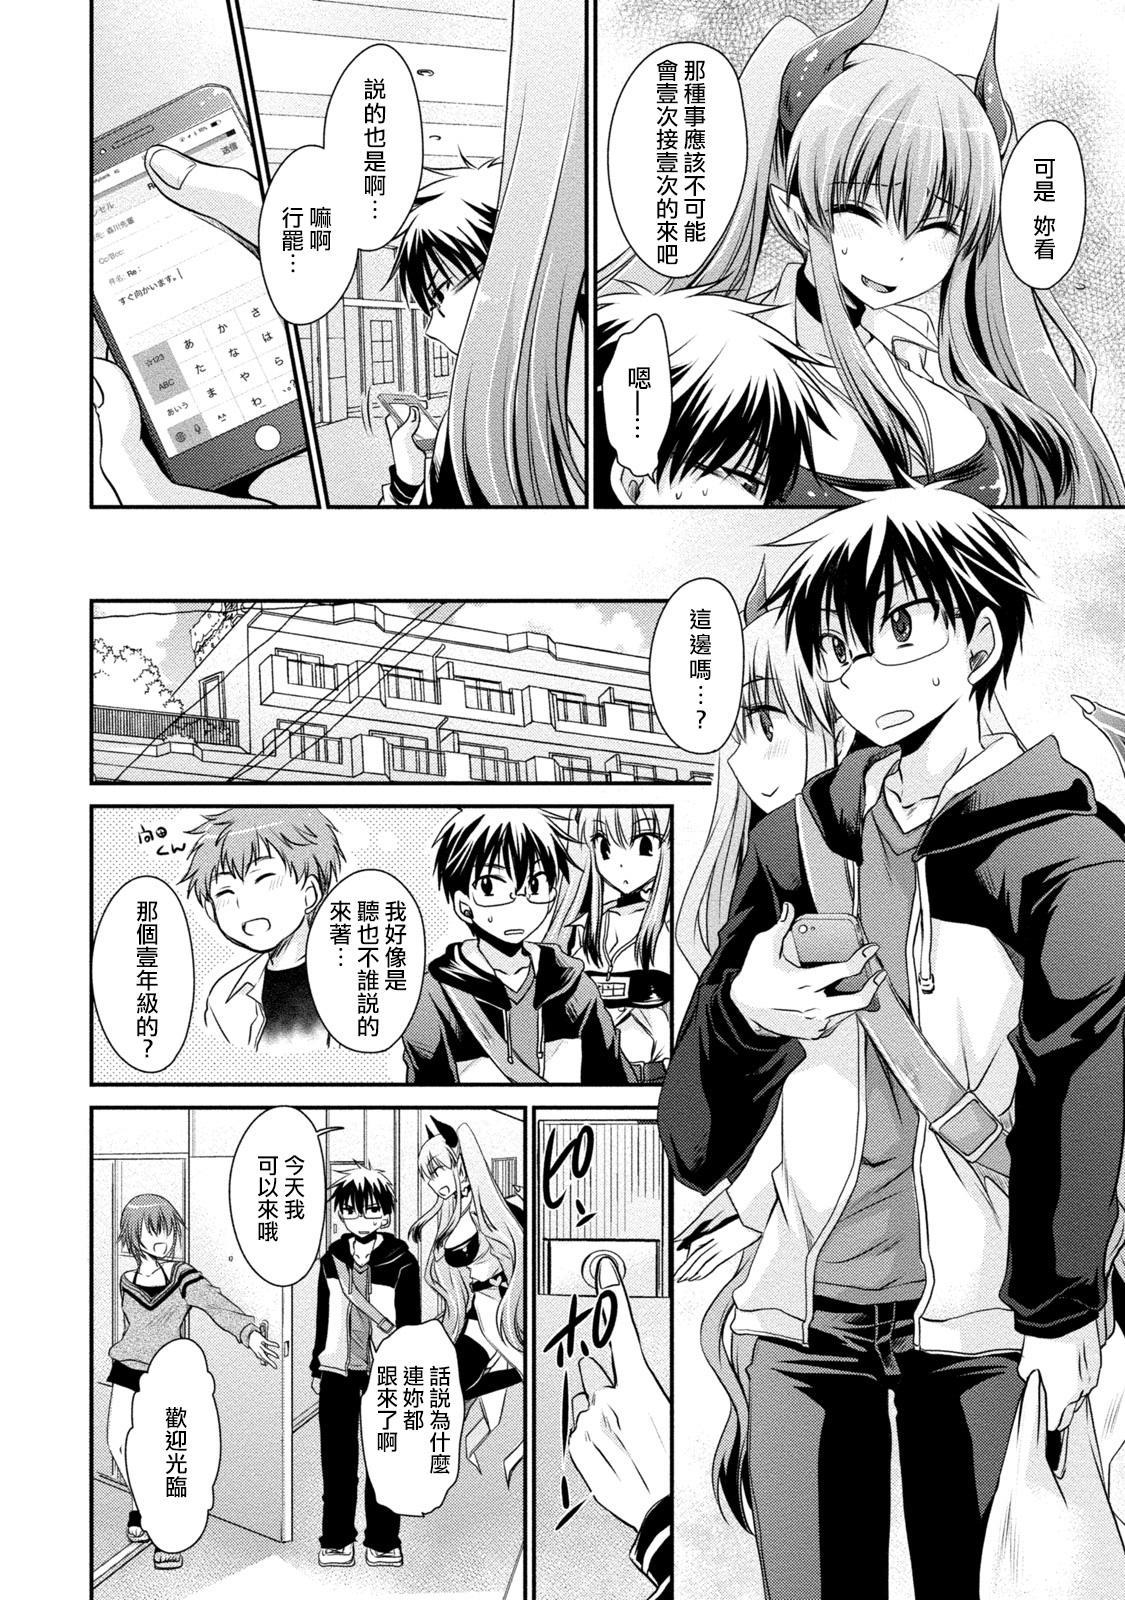 [Shinonome Ryu] Ore to Kanojo to Owaru Sekai - World's end LoveStory ch.10-13 [Chinese] [爱弹幕汉化组] [Digital] 33